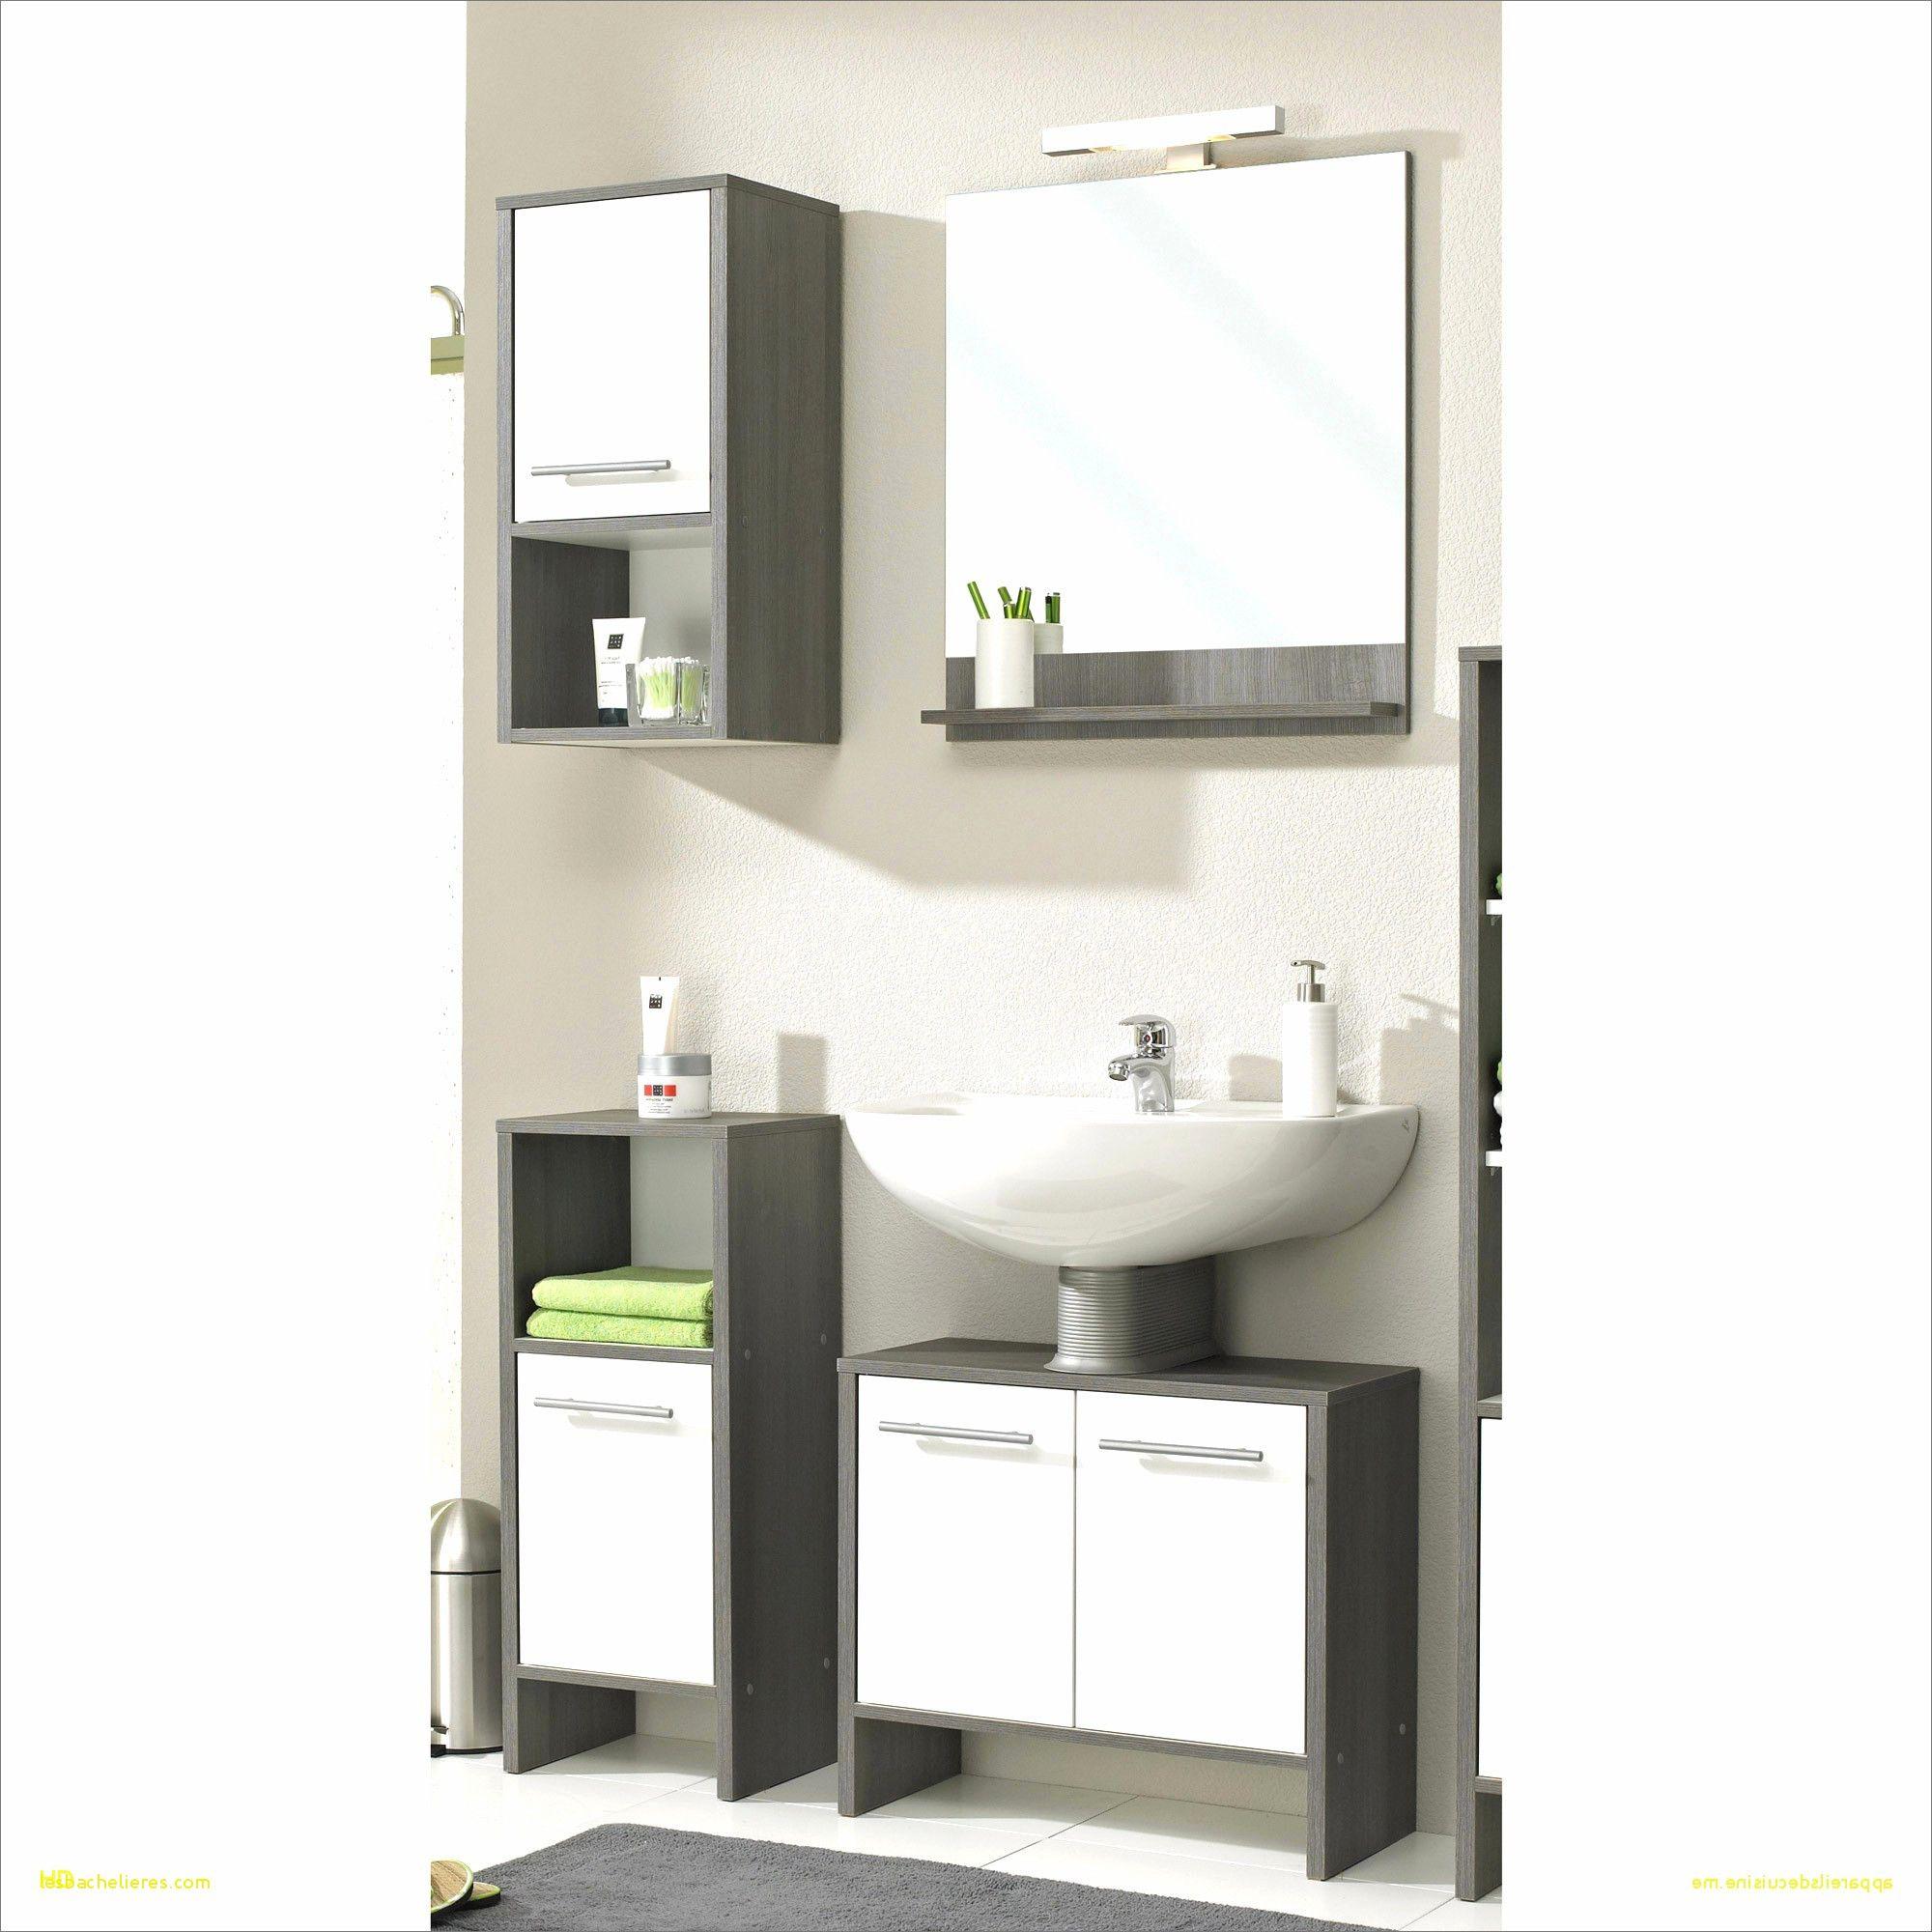 Armoire De Toilette Sanijura Armoire De Toilette Sanijura Outlet Vandenbergh Meuble Sanijura Soon Avec Armoire De Toilette Ec Bathroom Vanity Bathroom Vanity